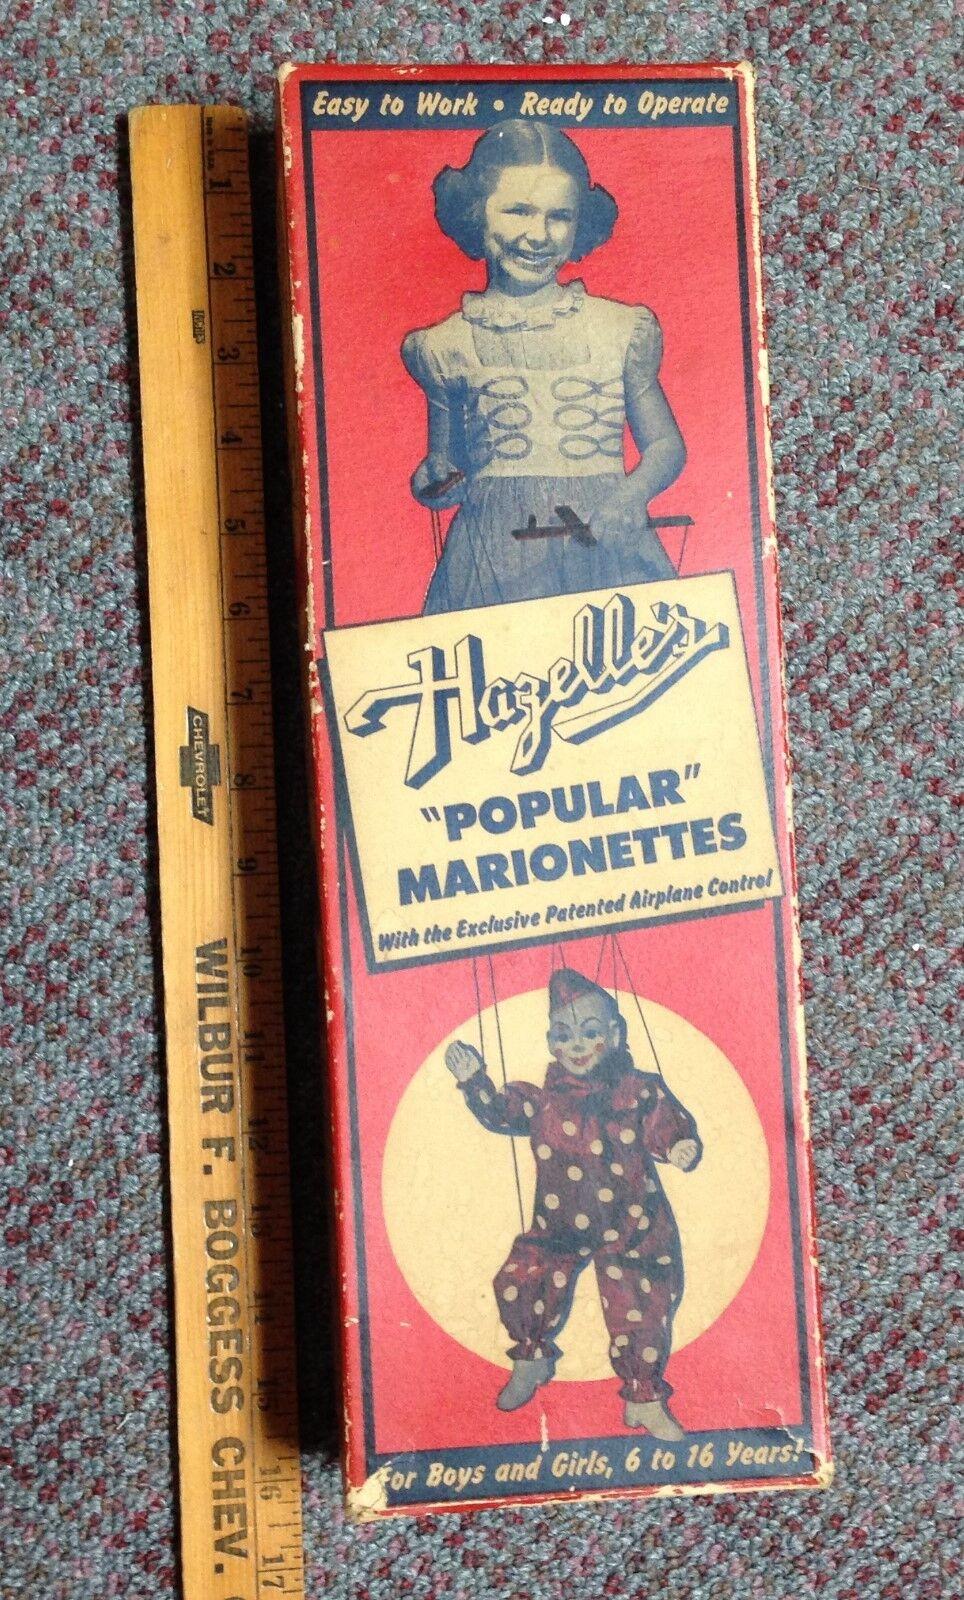 Vintage Hazelle's Popular Marionettes Penny